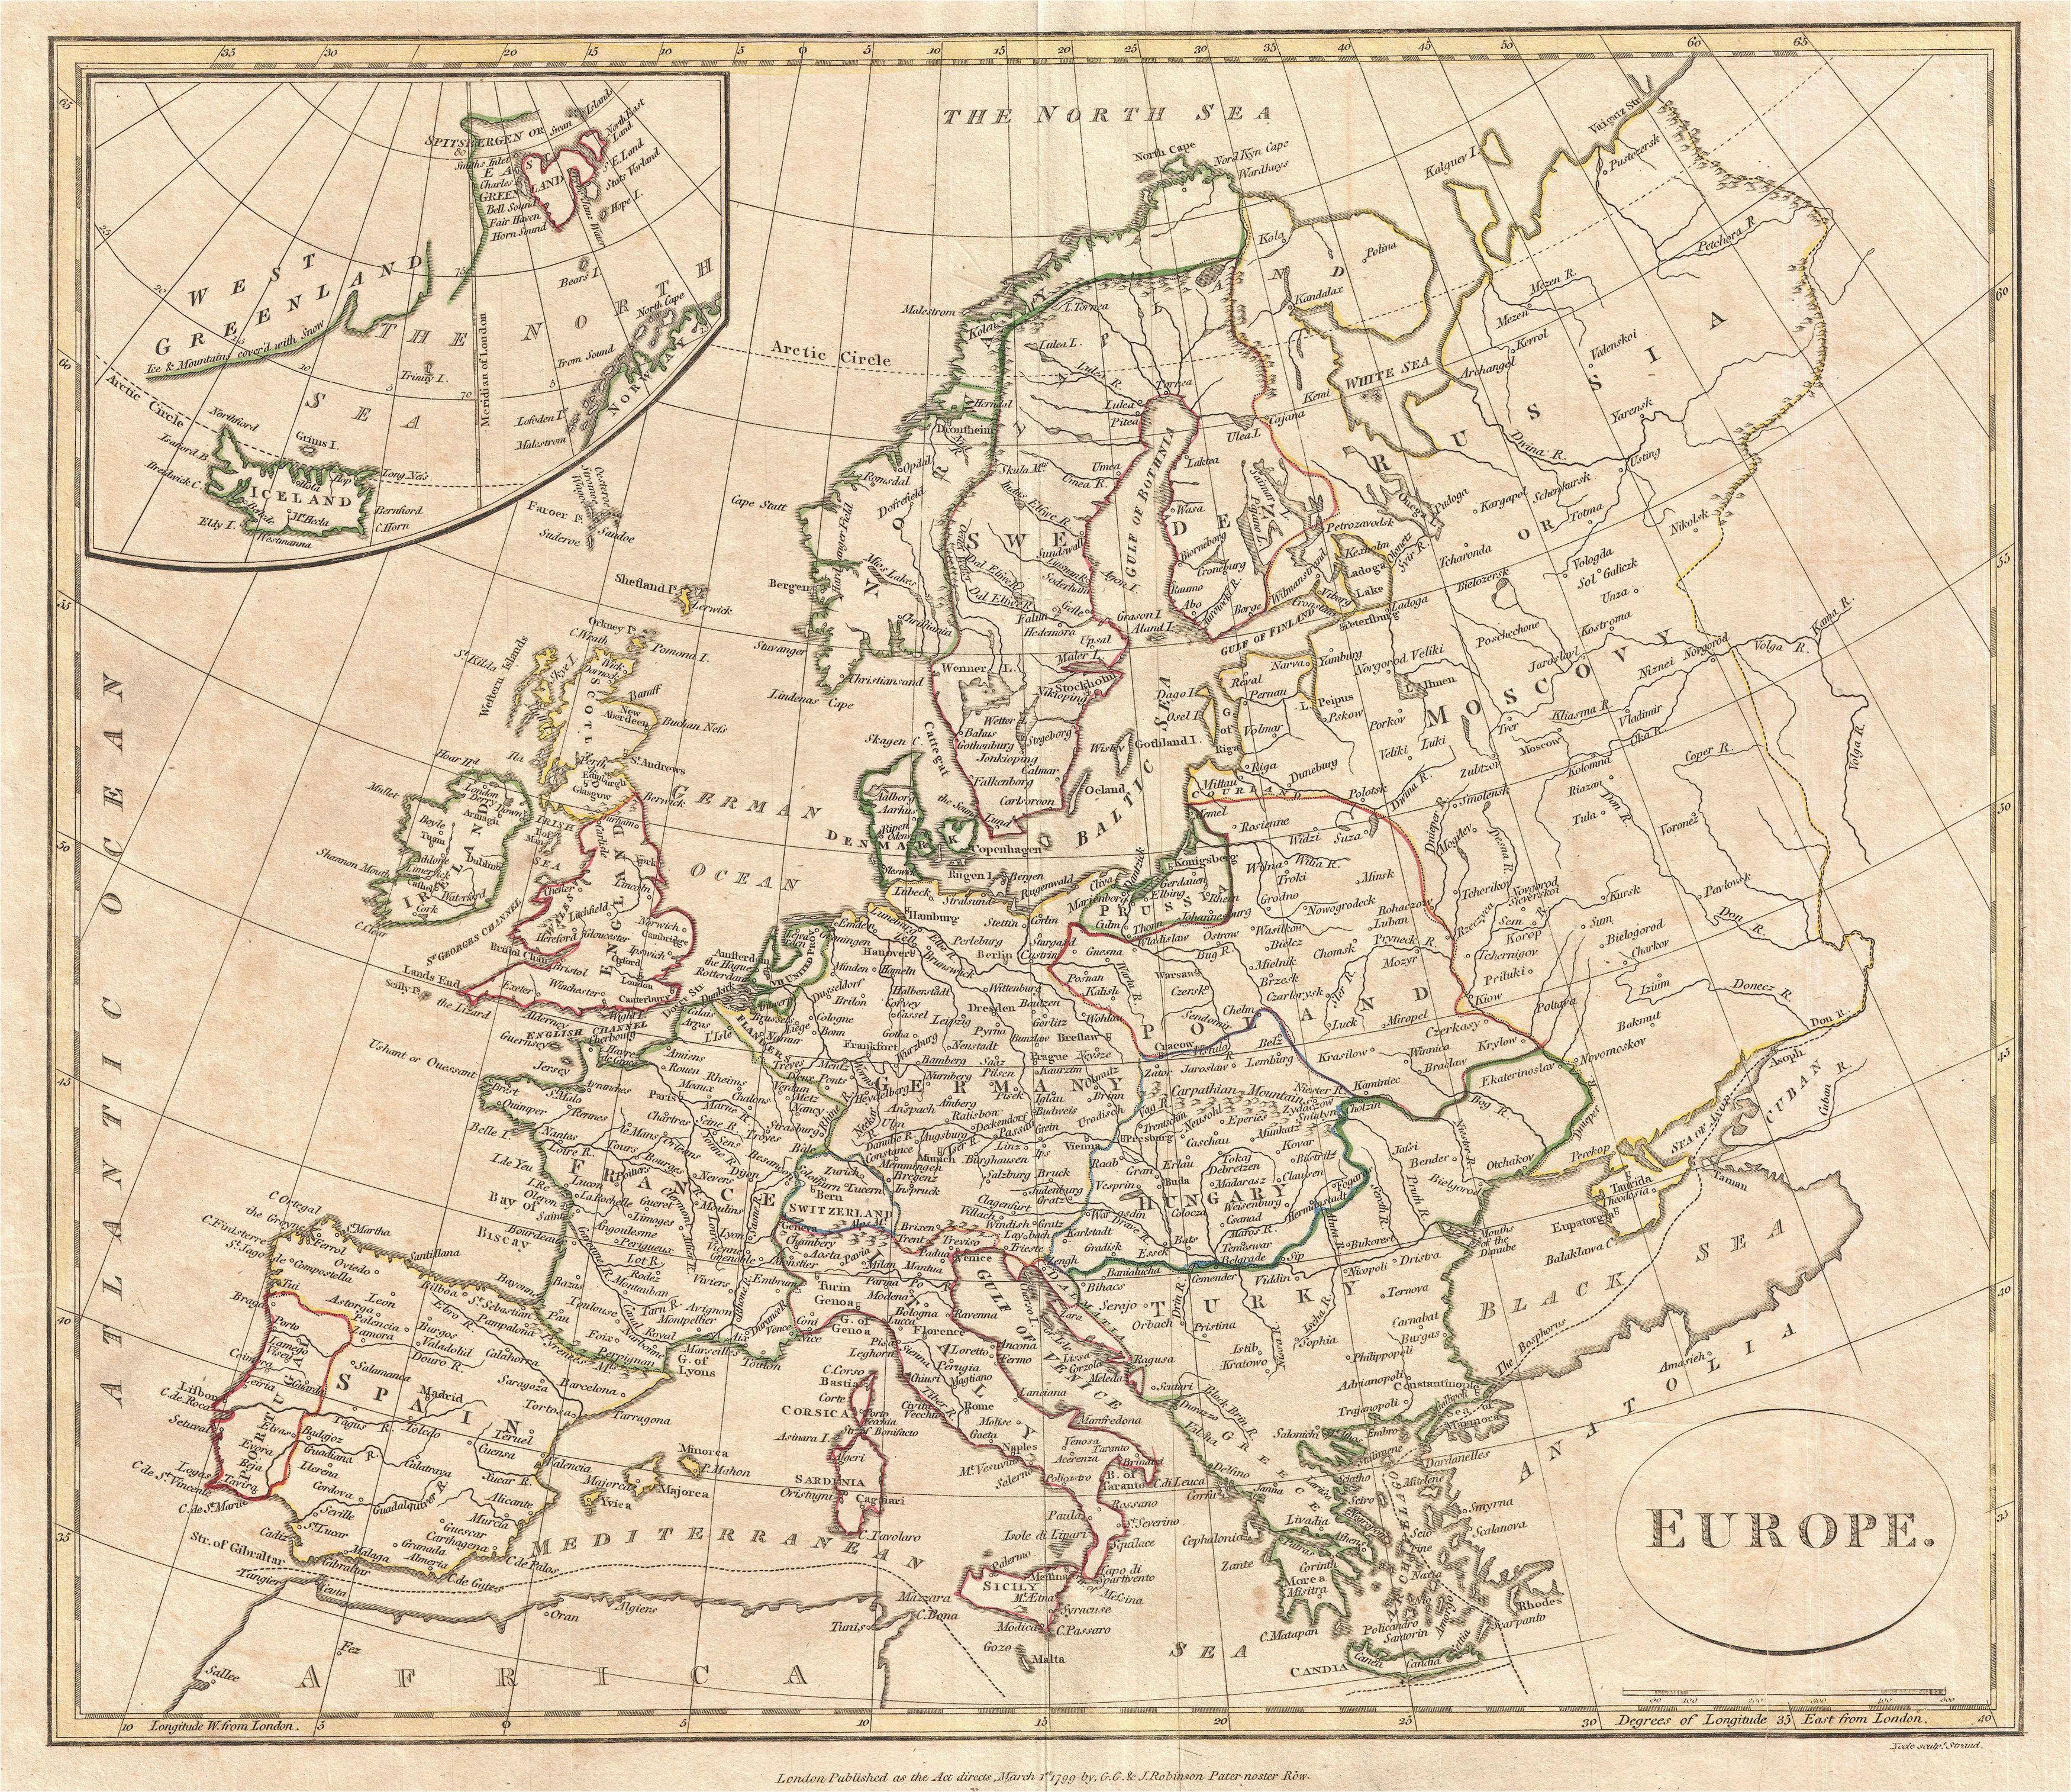 Big Map Of Europe atlas Of European History Wikimedia Commons